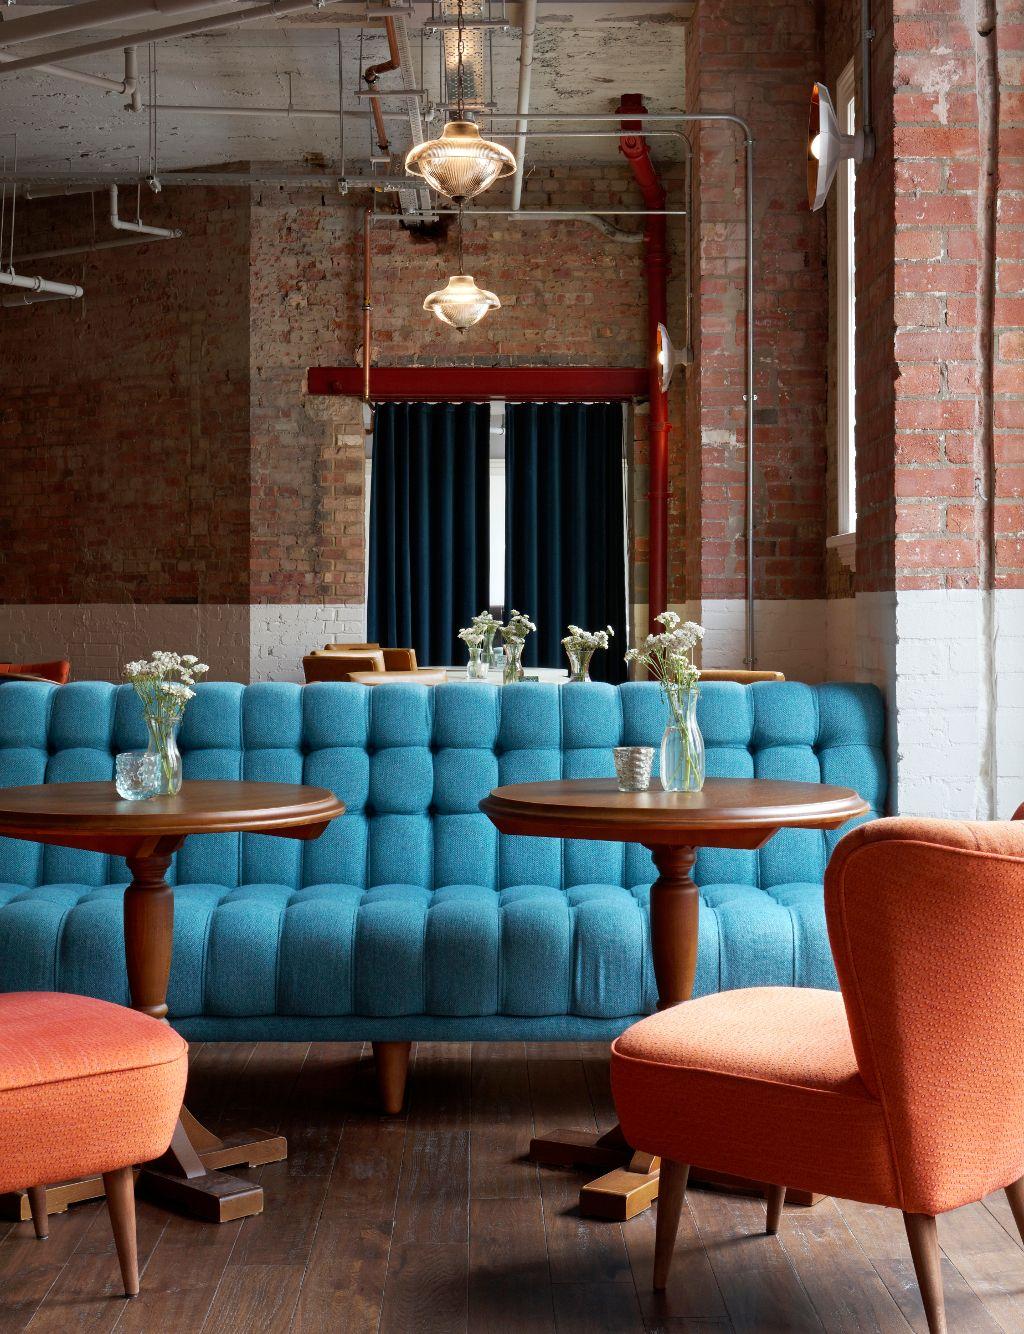 Banco Restaurante Capiton En Terciopelo Azul Bancada Wall Bench  # Barre Duque Muebles